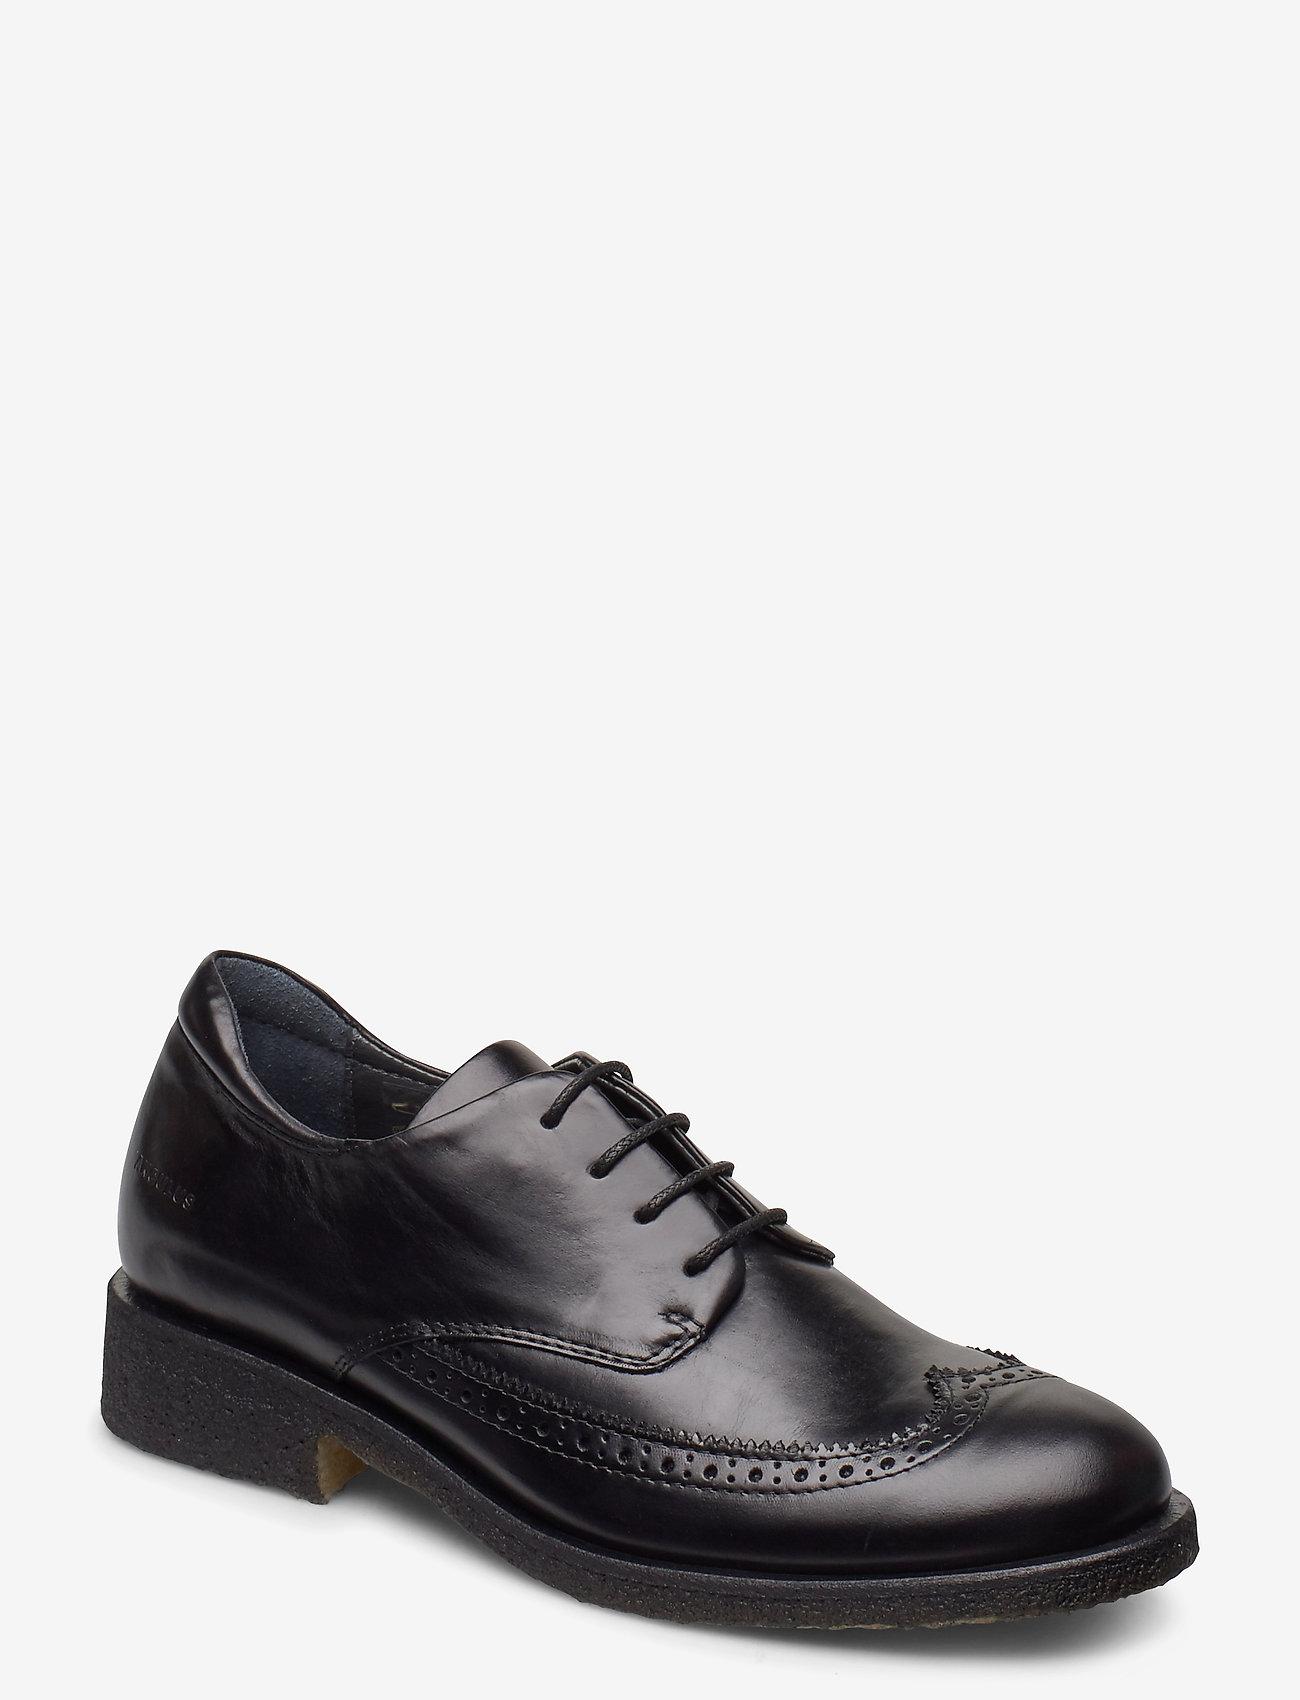 ANGULUS - Shoes - flat - with lace - buty sznurowane - 1835 black - 0